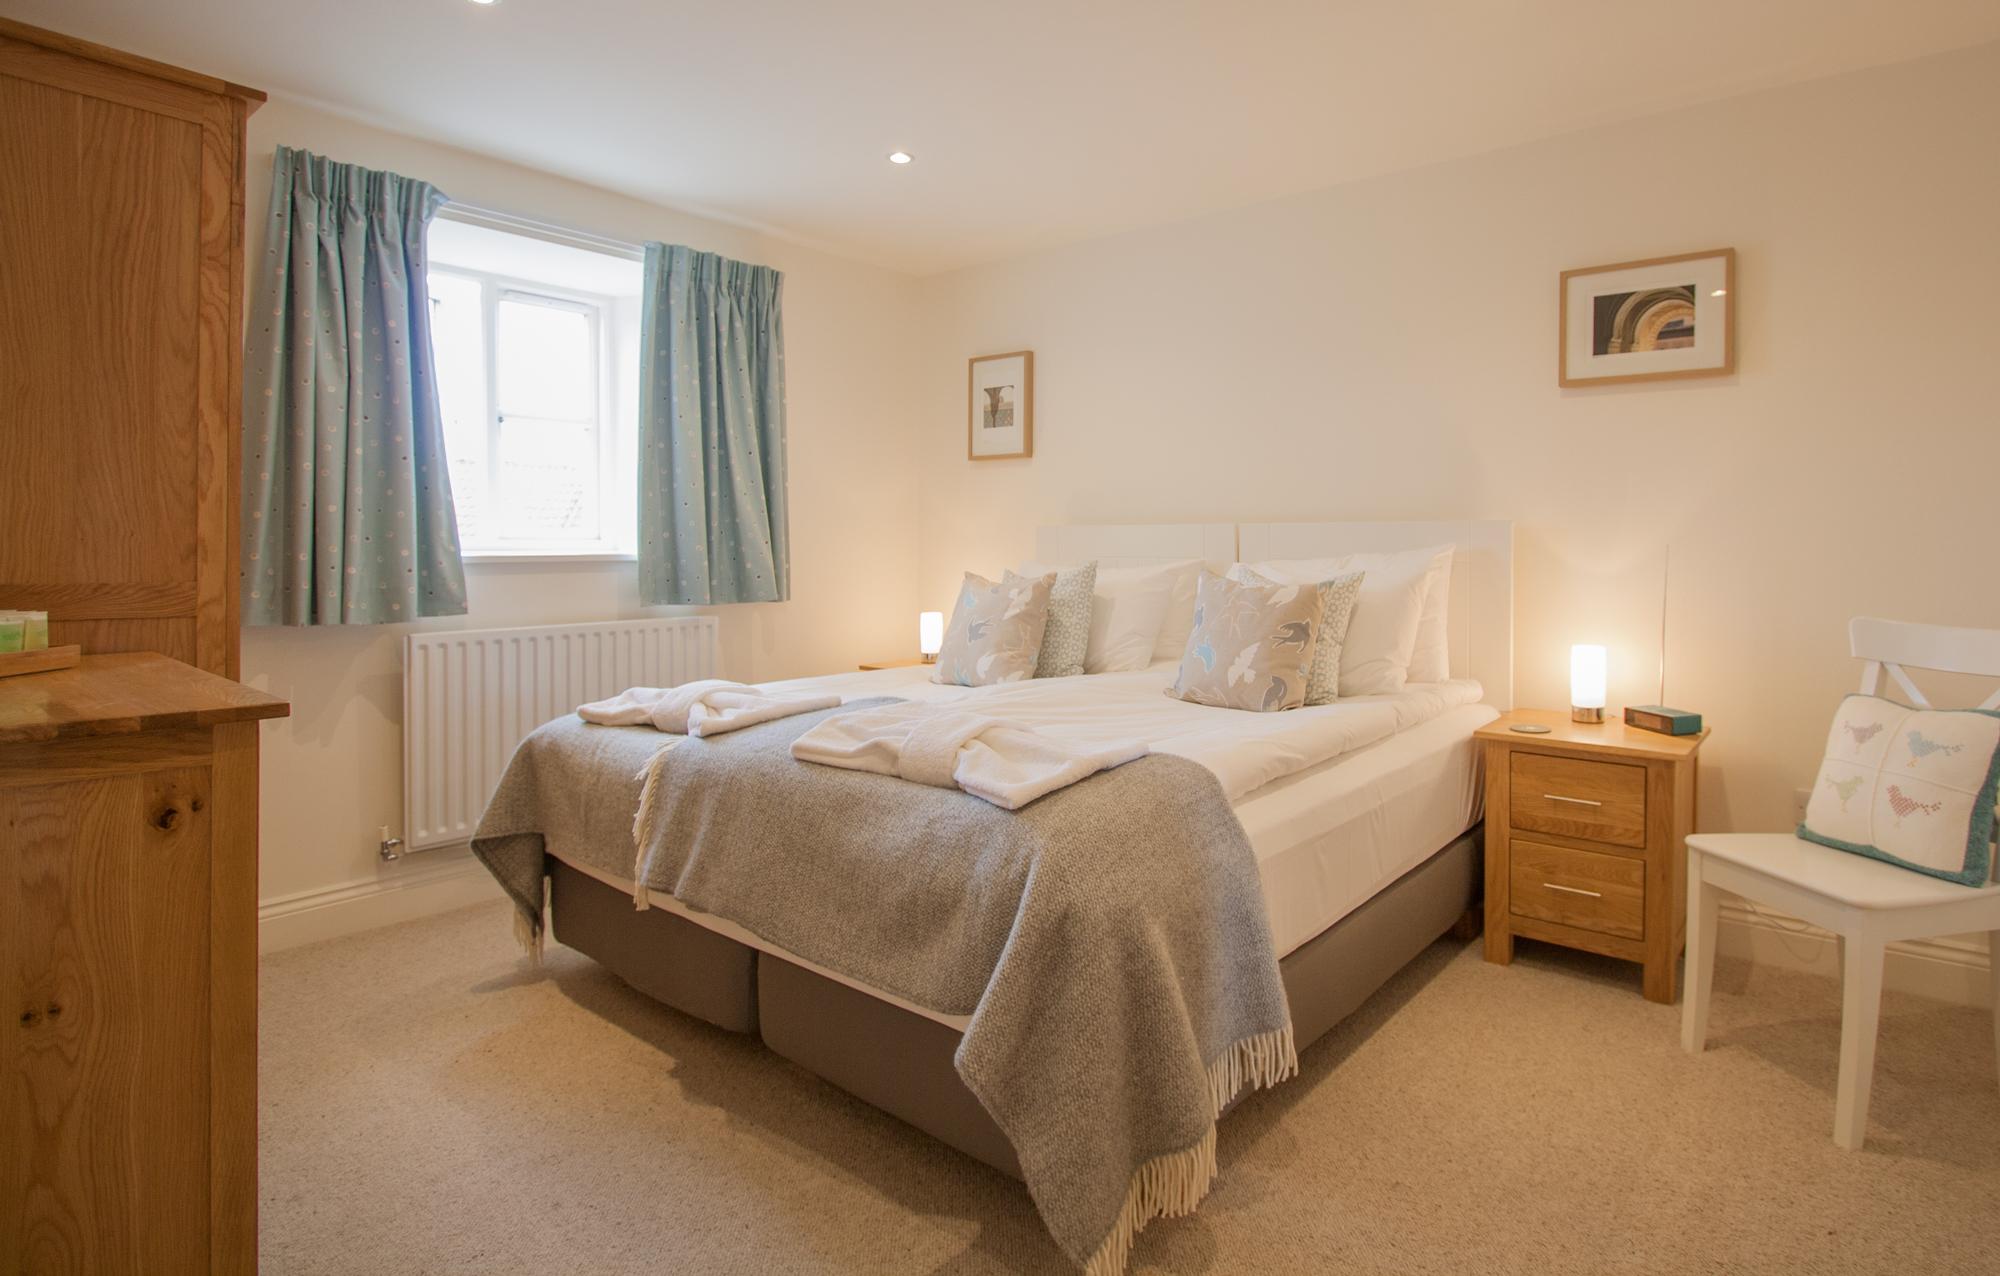 coastal luxury holiday homes Warenton and Bamburgh, coastal retreats luxury no pets